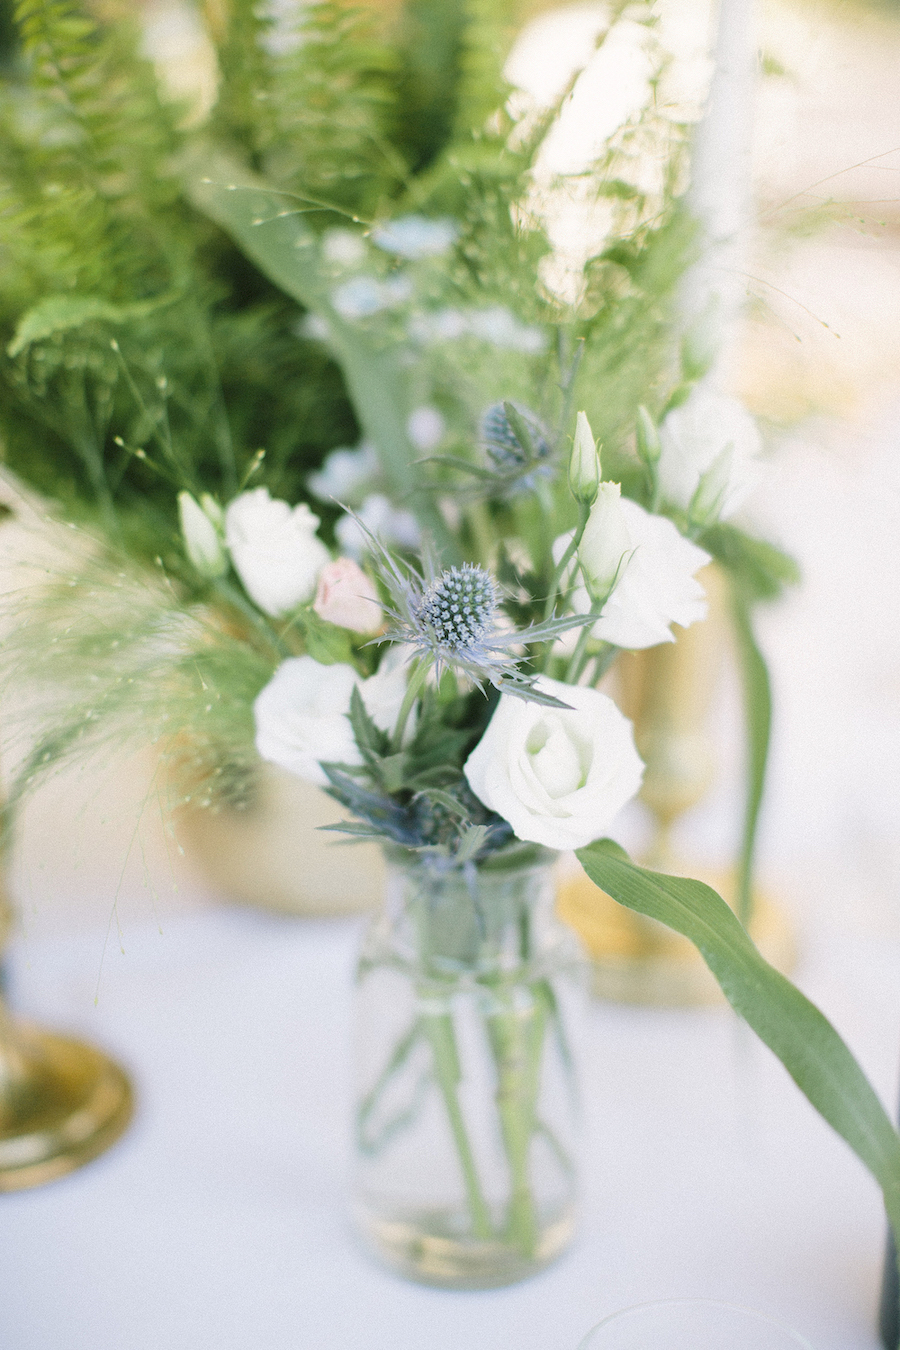 saya-photography-jewish-wedding-provence-rustic-lourmarin-le-galinier-41.jpg